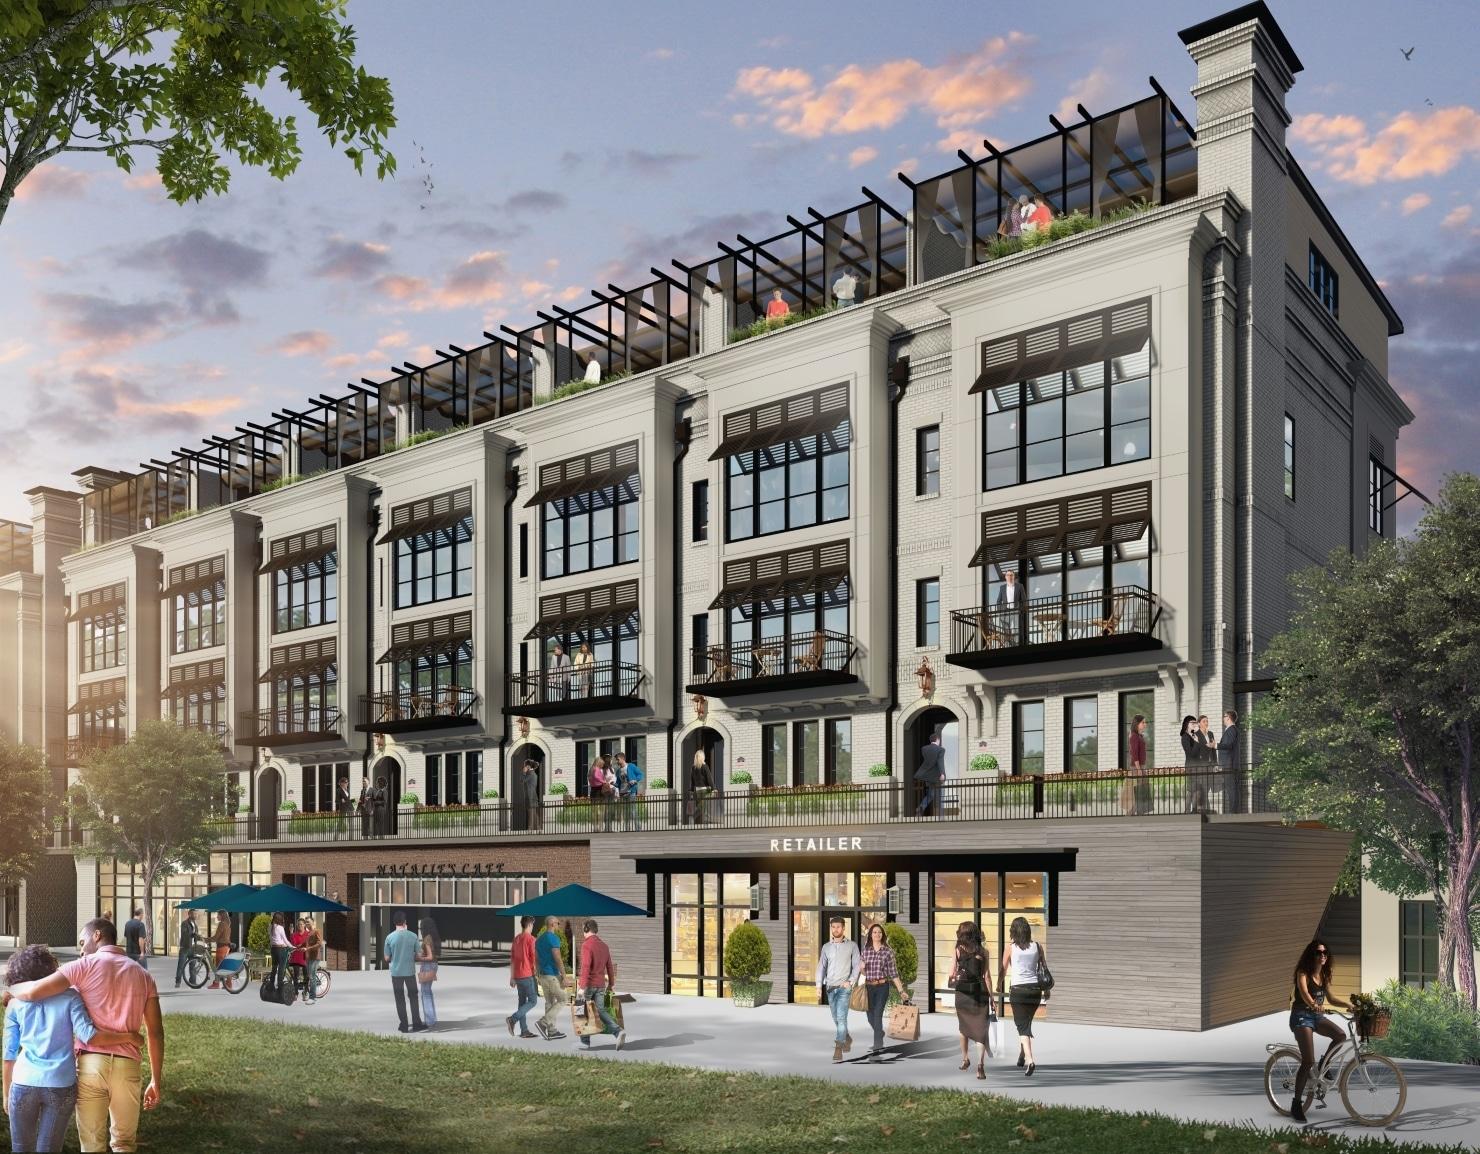 Studioplex Beltline Retail & Townhomes